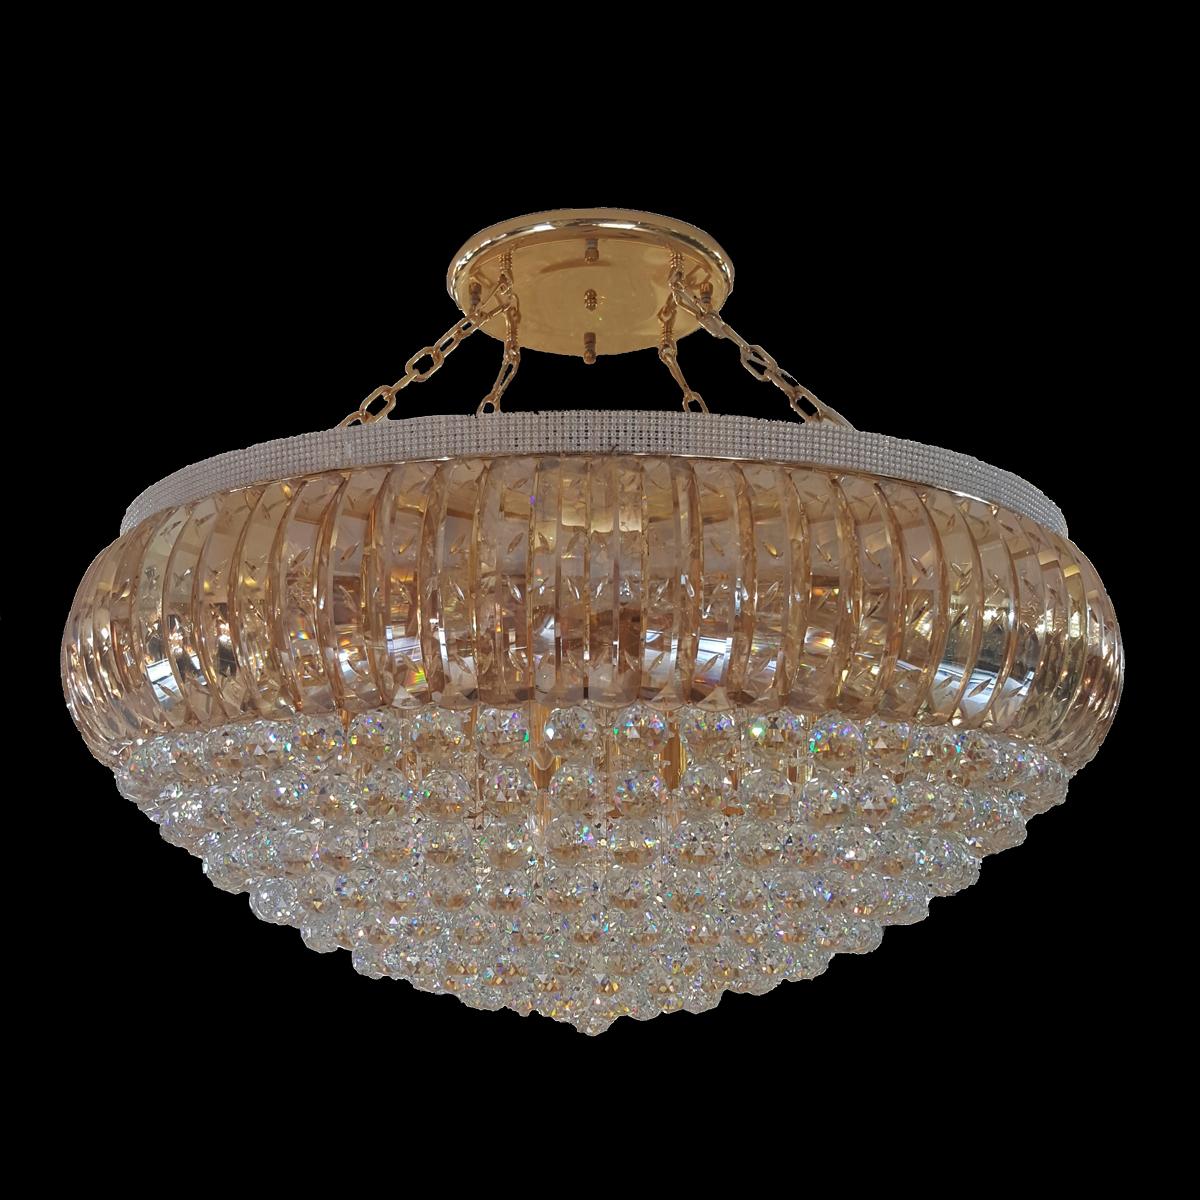 Dome 1000 Gold Chandelier - CRPDOM231000GD